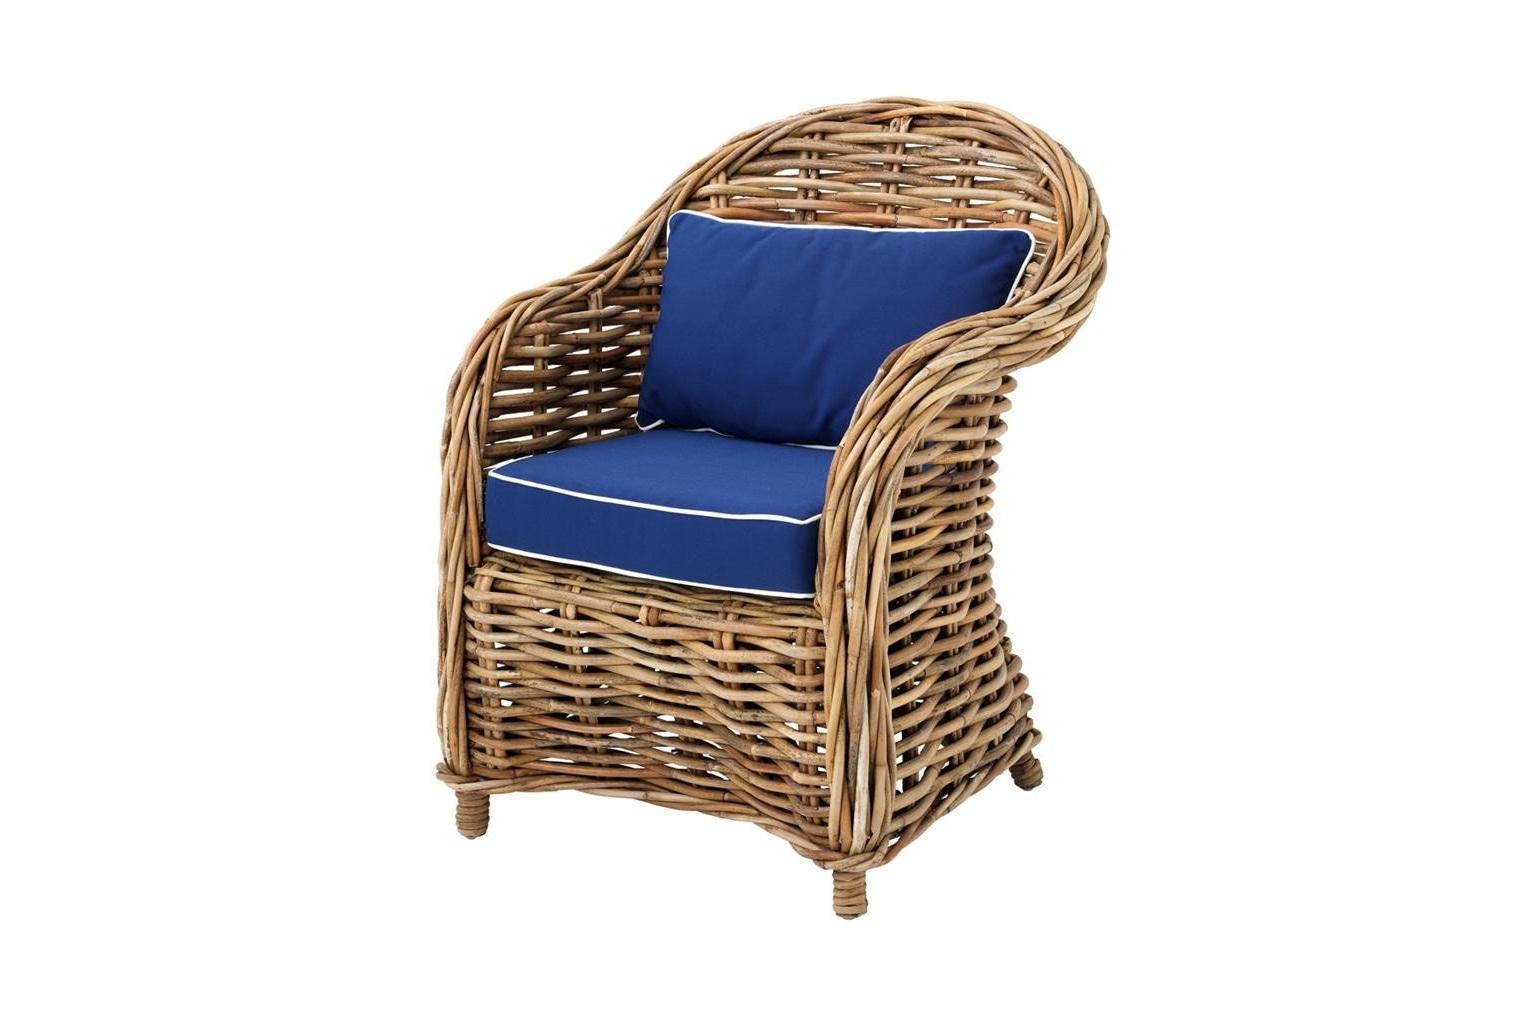 Кресло PretoriaКресла для сада<br><br><br>Material: Ротанг<br>Width см: 64<br>Depth см: 70<br>Height см: 88